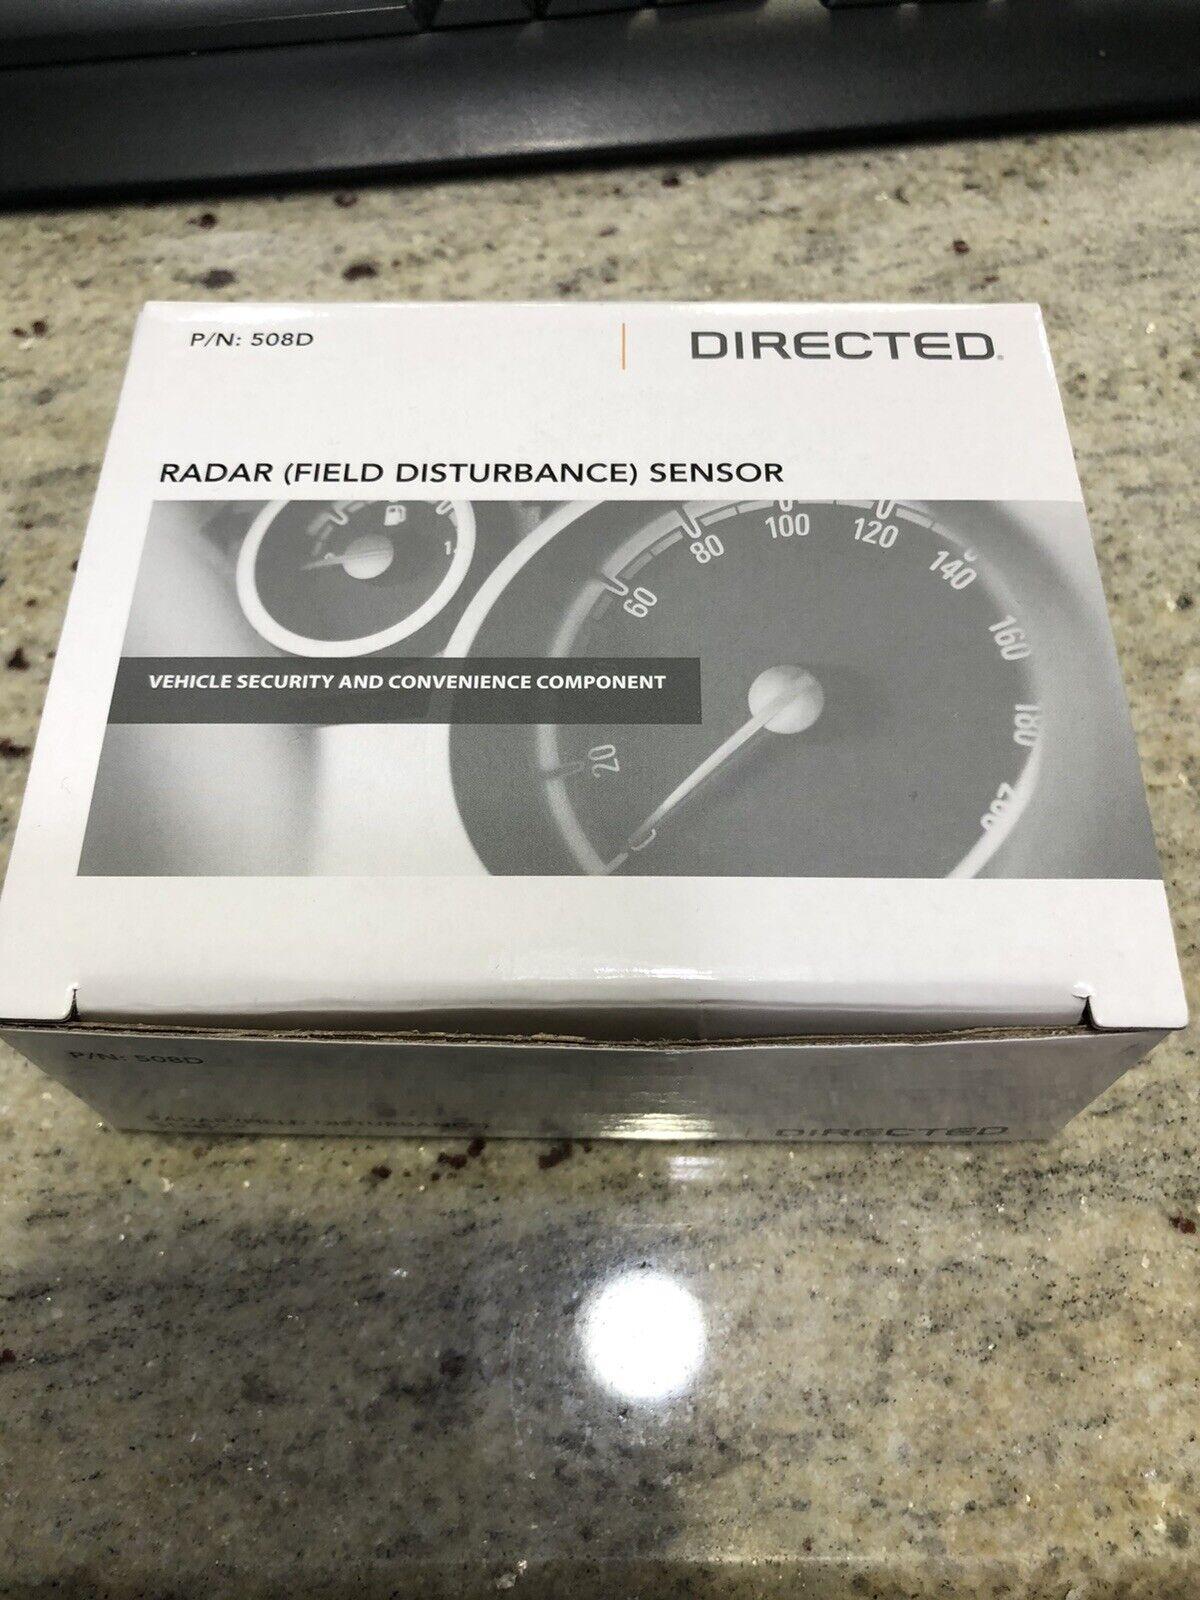 Invisibeam Field Disturbance Sensor DIRECTED 508D DEI Dual Zone Motion Radar